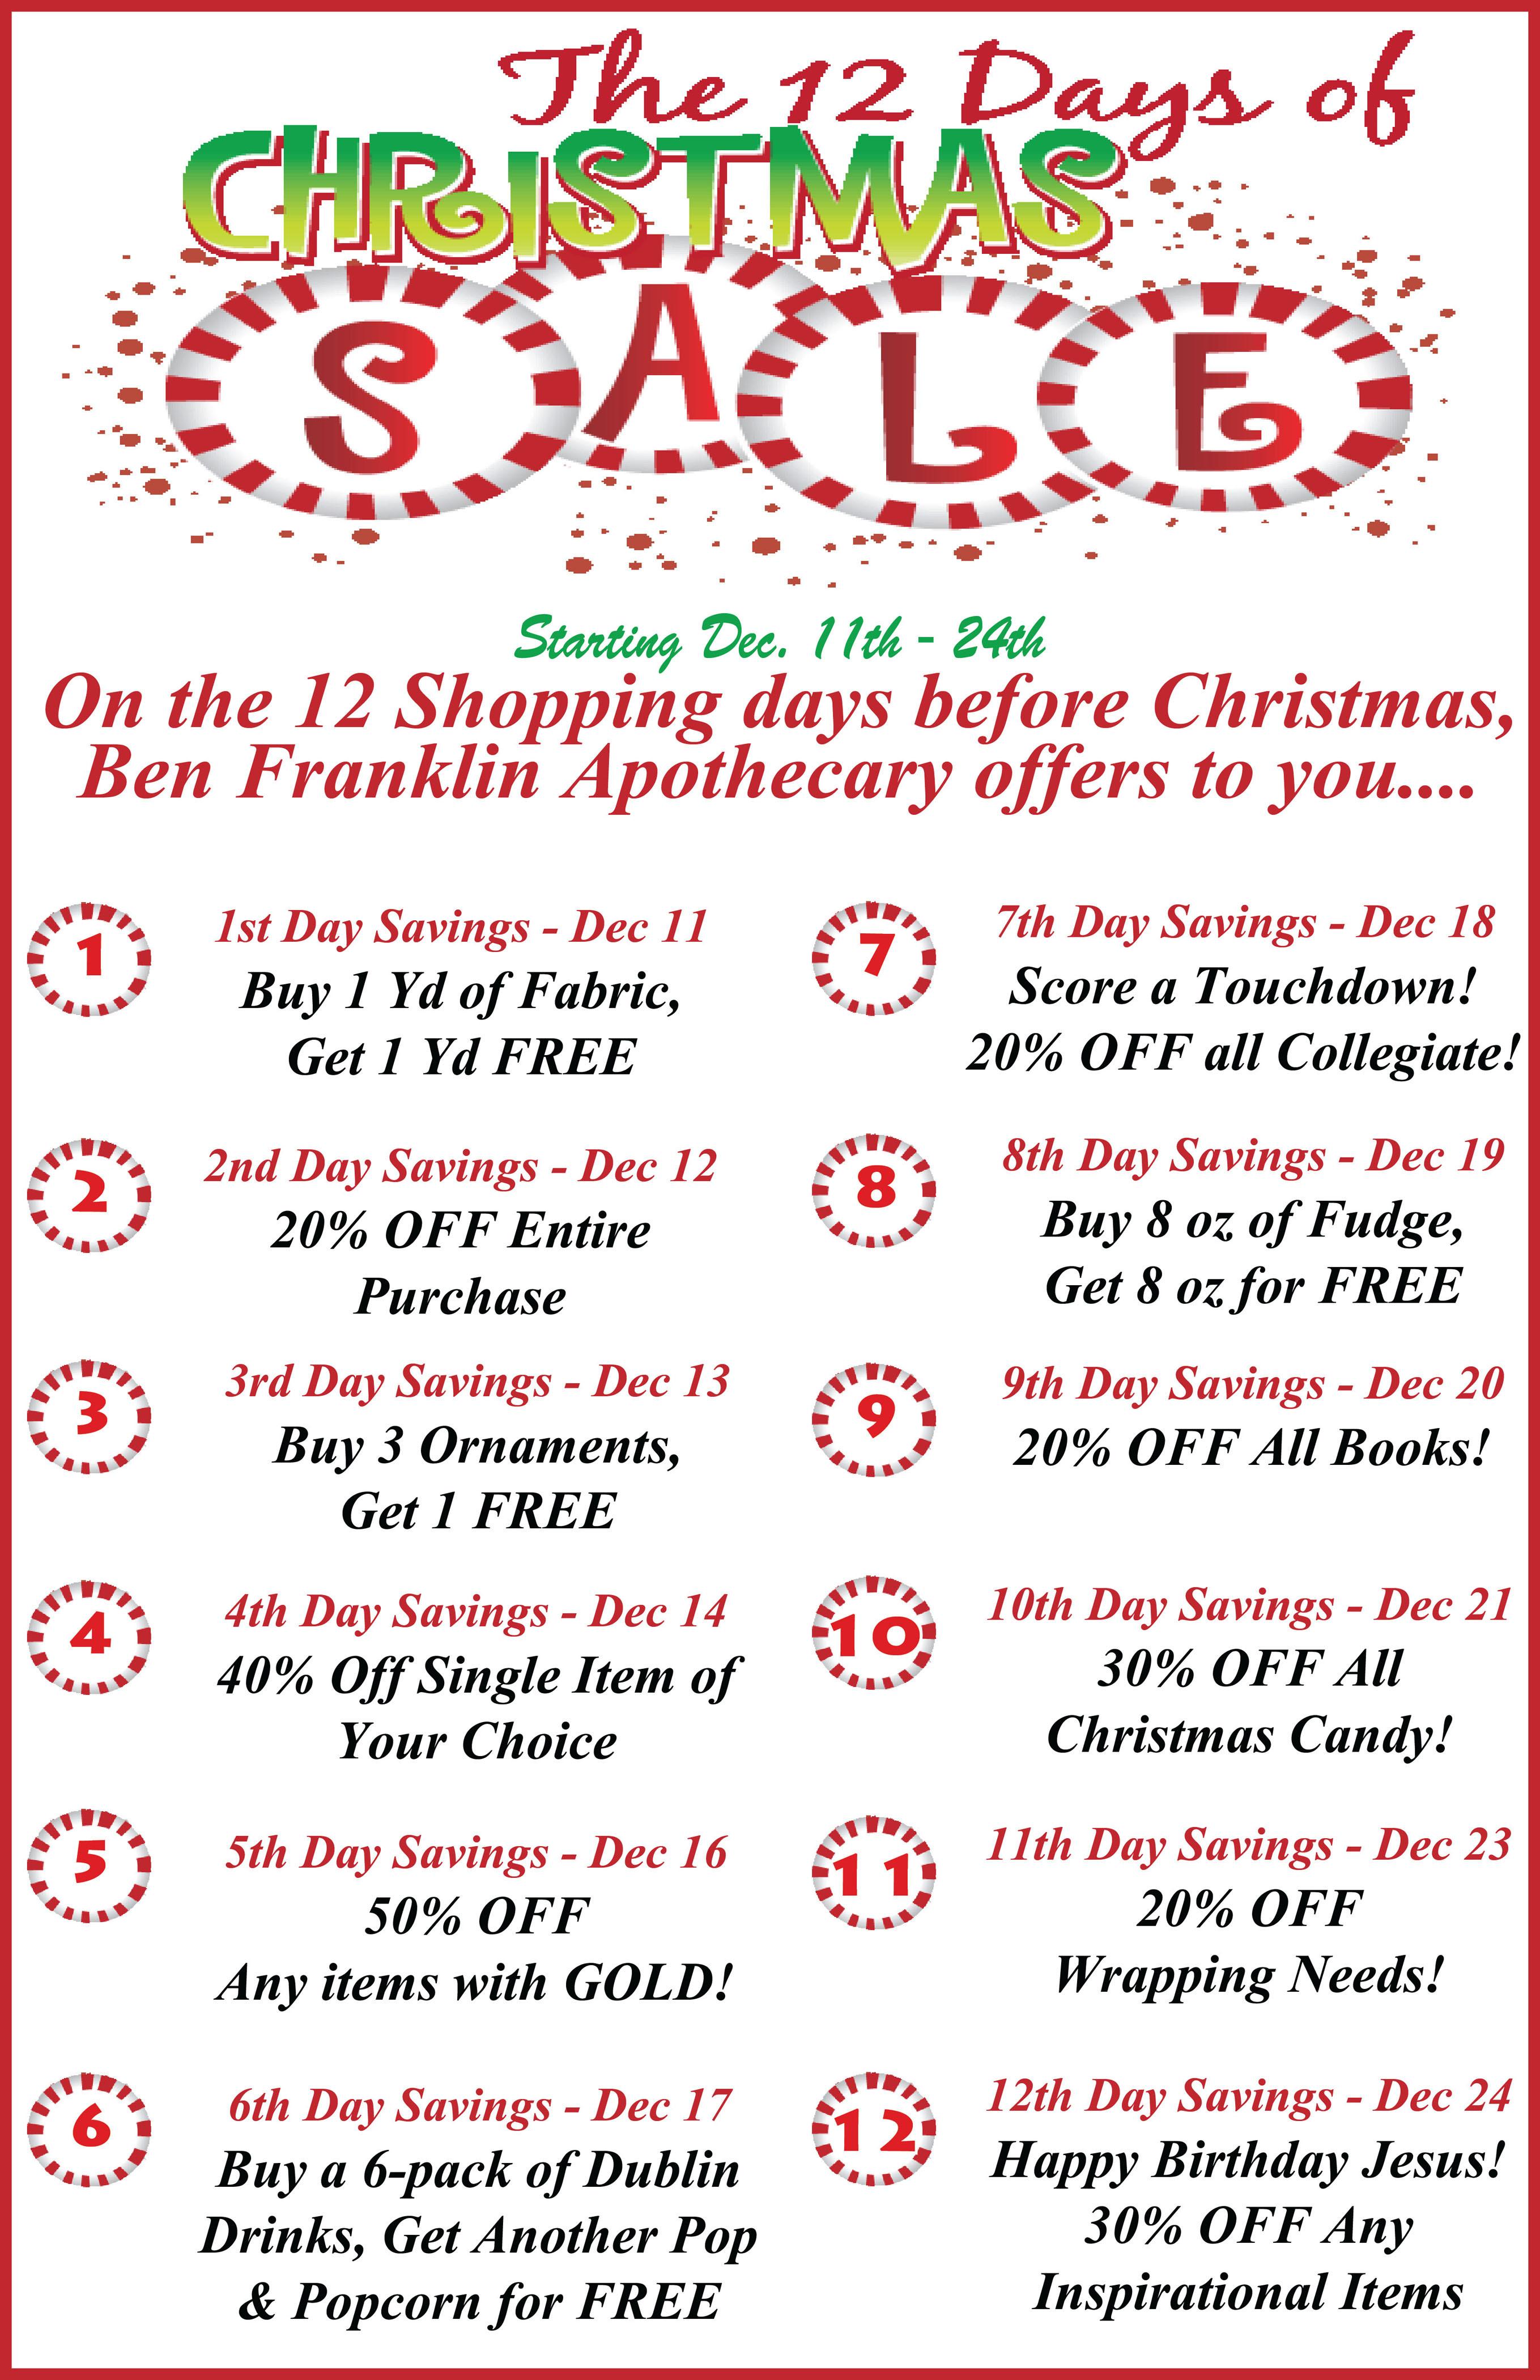 Christmas Gift Exchange Ideas  unique t ideas Ben Franklin Apothecary Blog